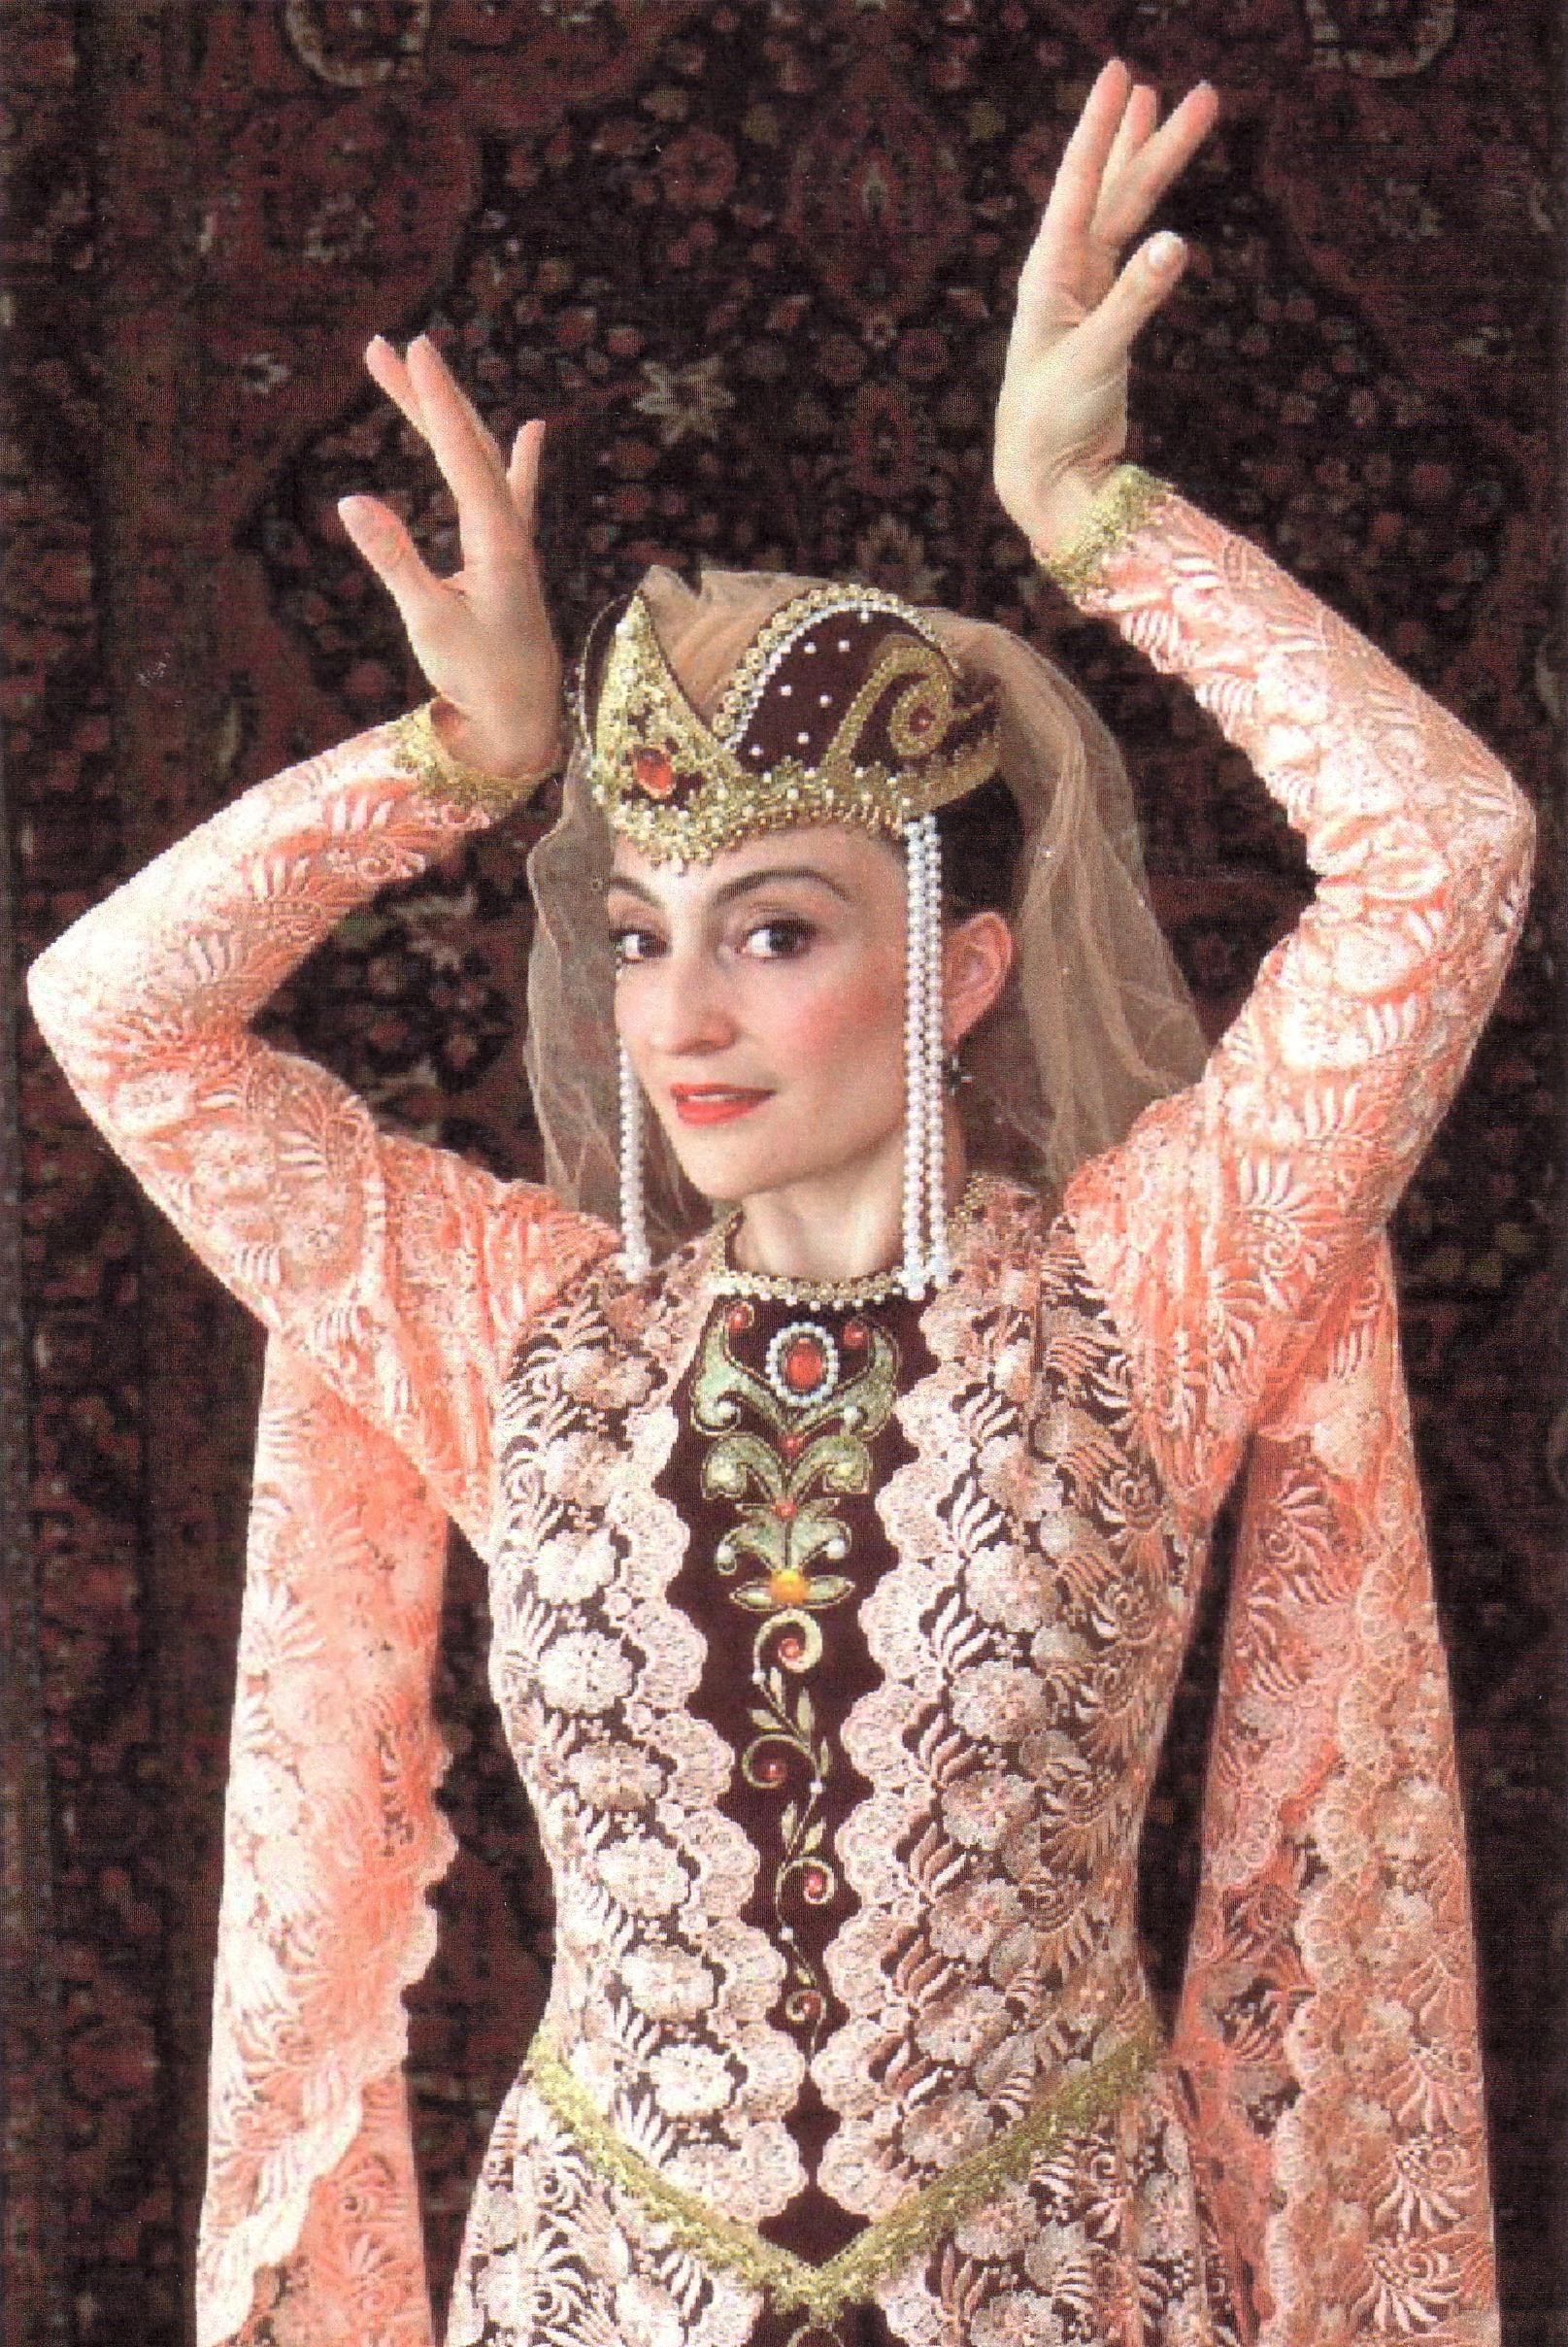 Shakeh Major Tchilingirian, Dancer and Orthoptist.